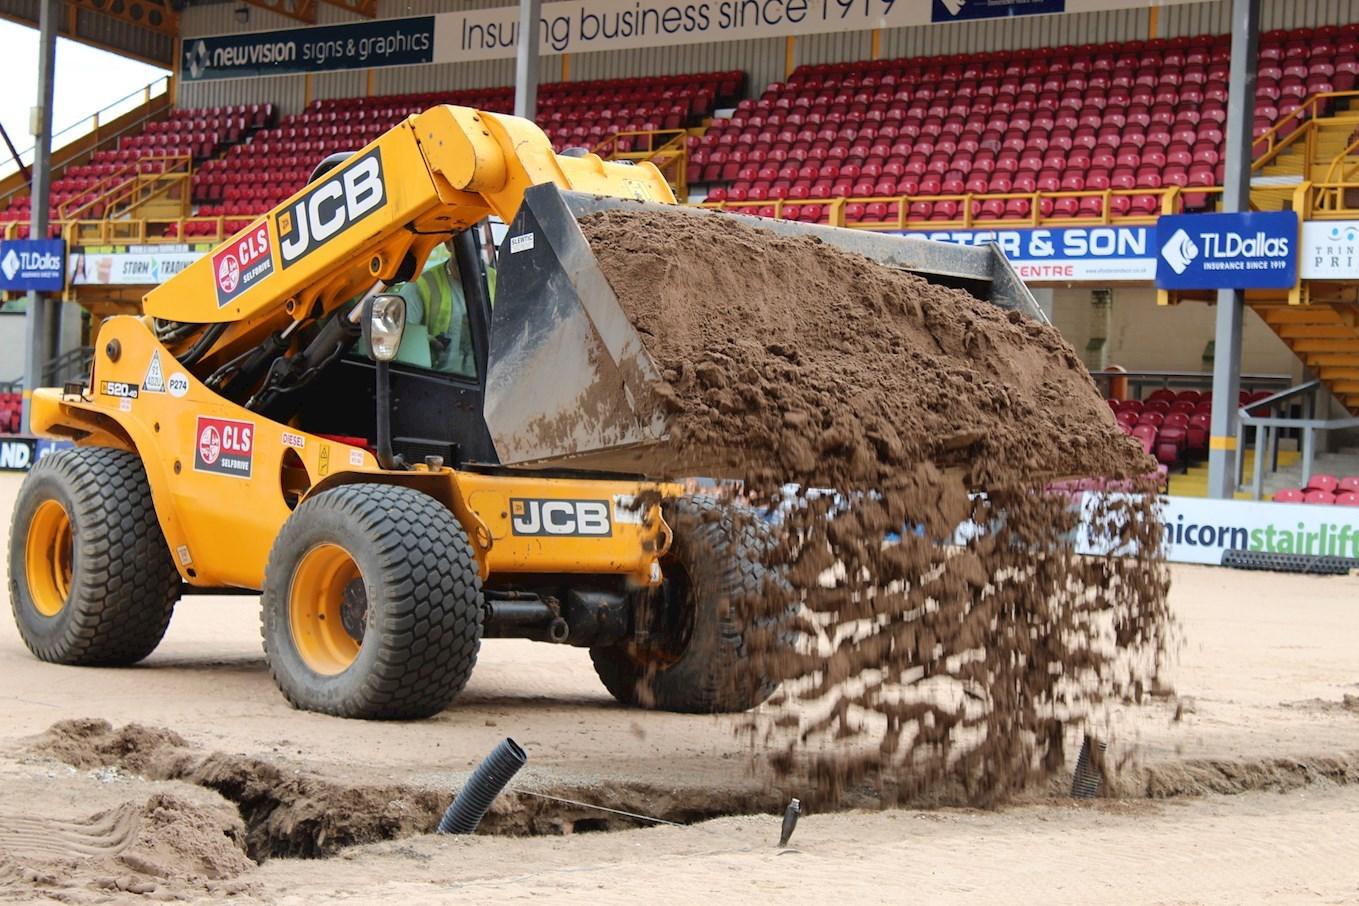 New Pitch Update - News - Bradford City